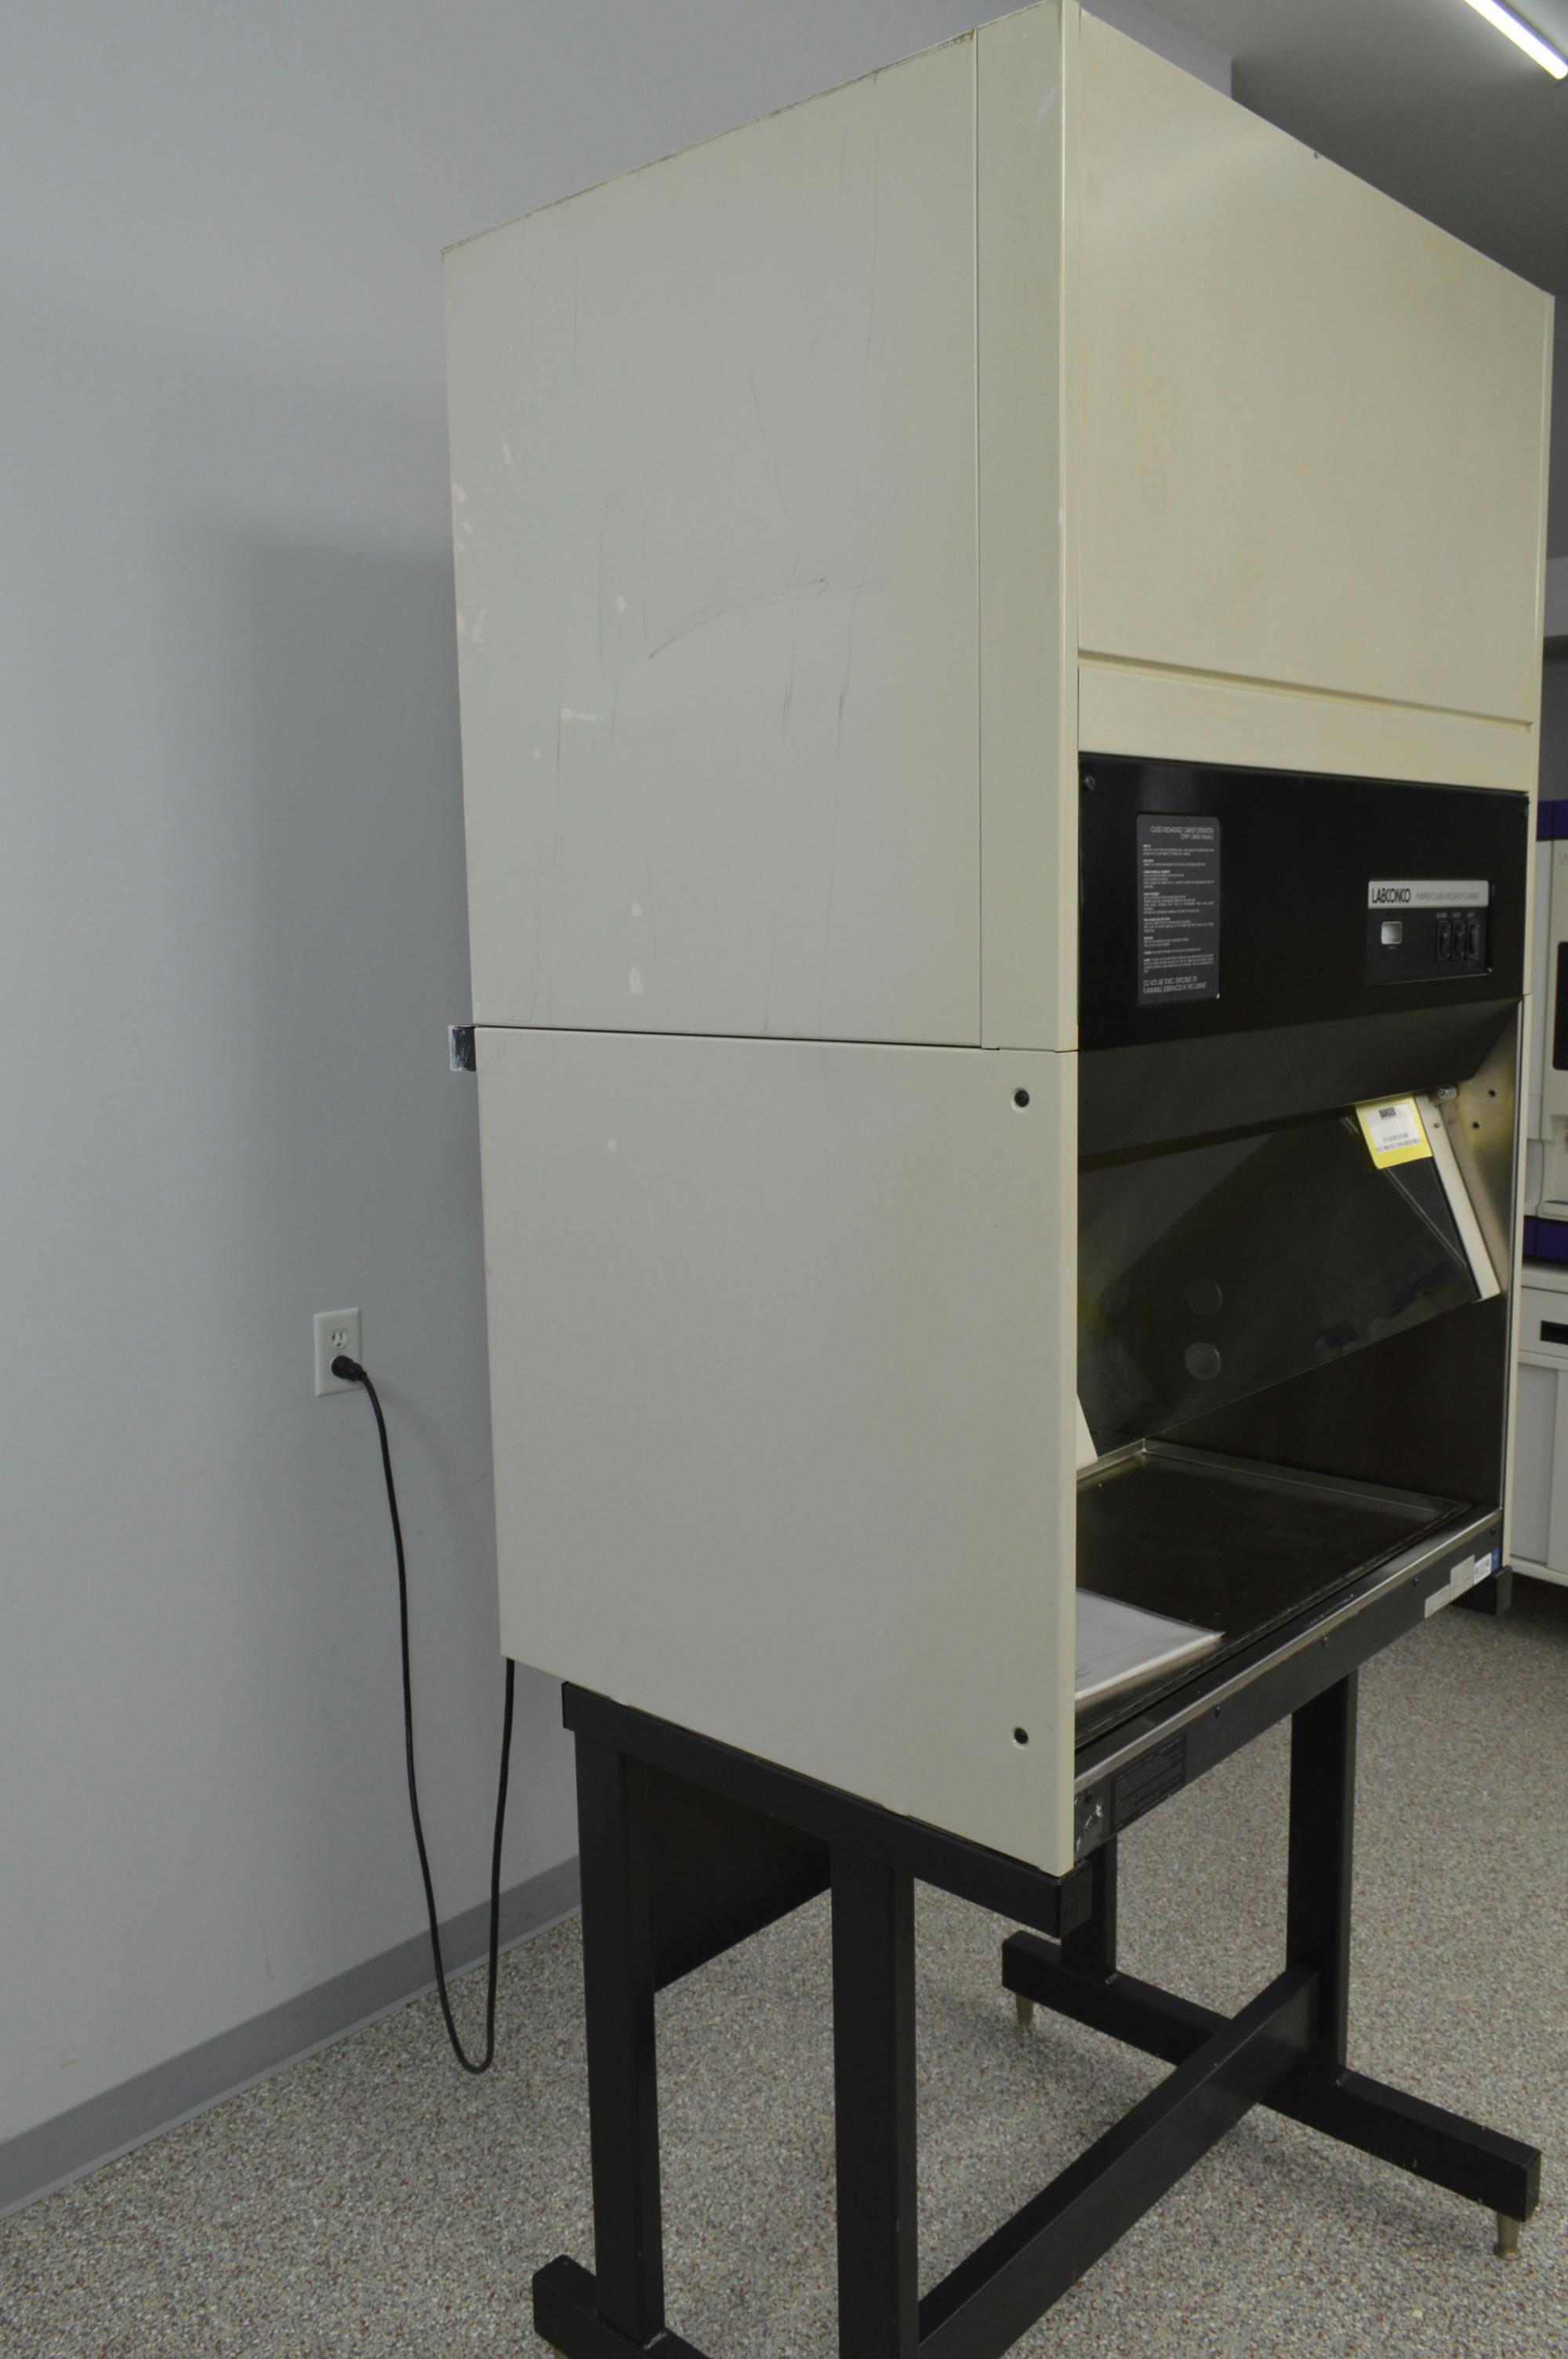 Labconco Purifier Class Ii Biosafety Cabinet Hood 36204 04